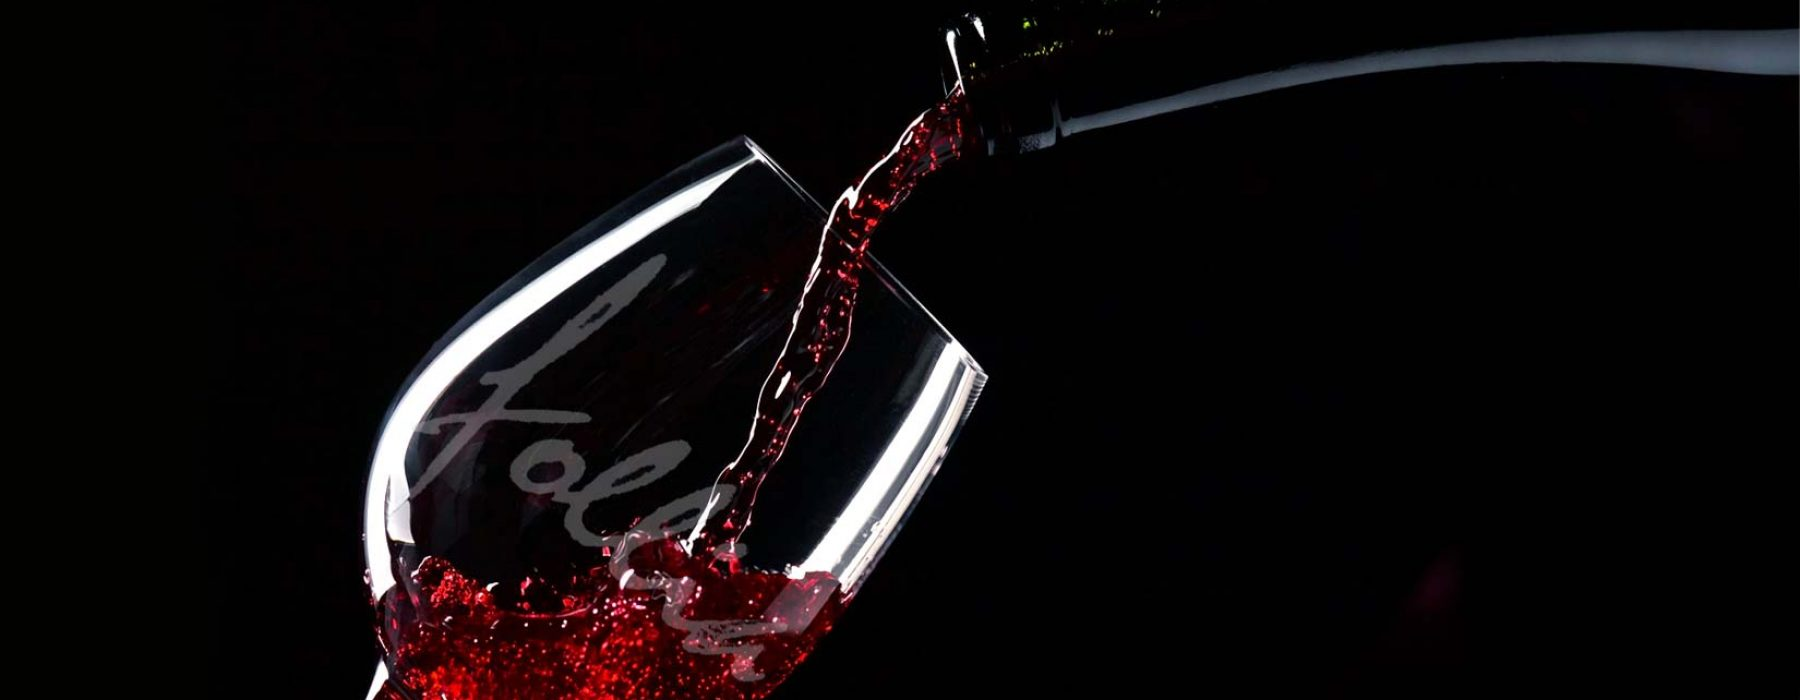 Piana dei Castelli: Вино по любви